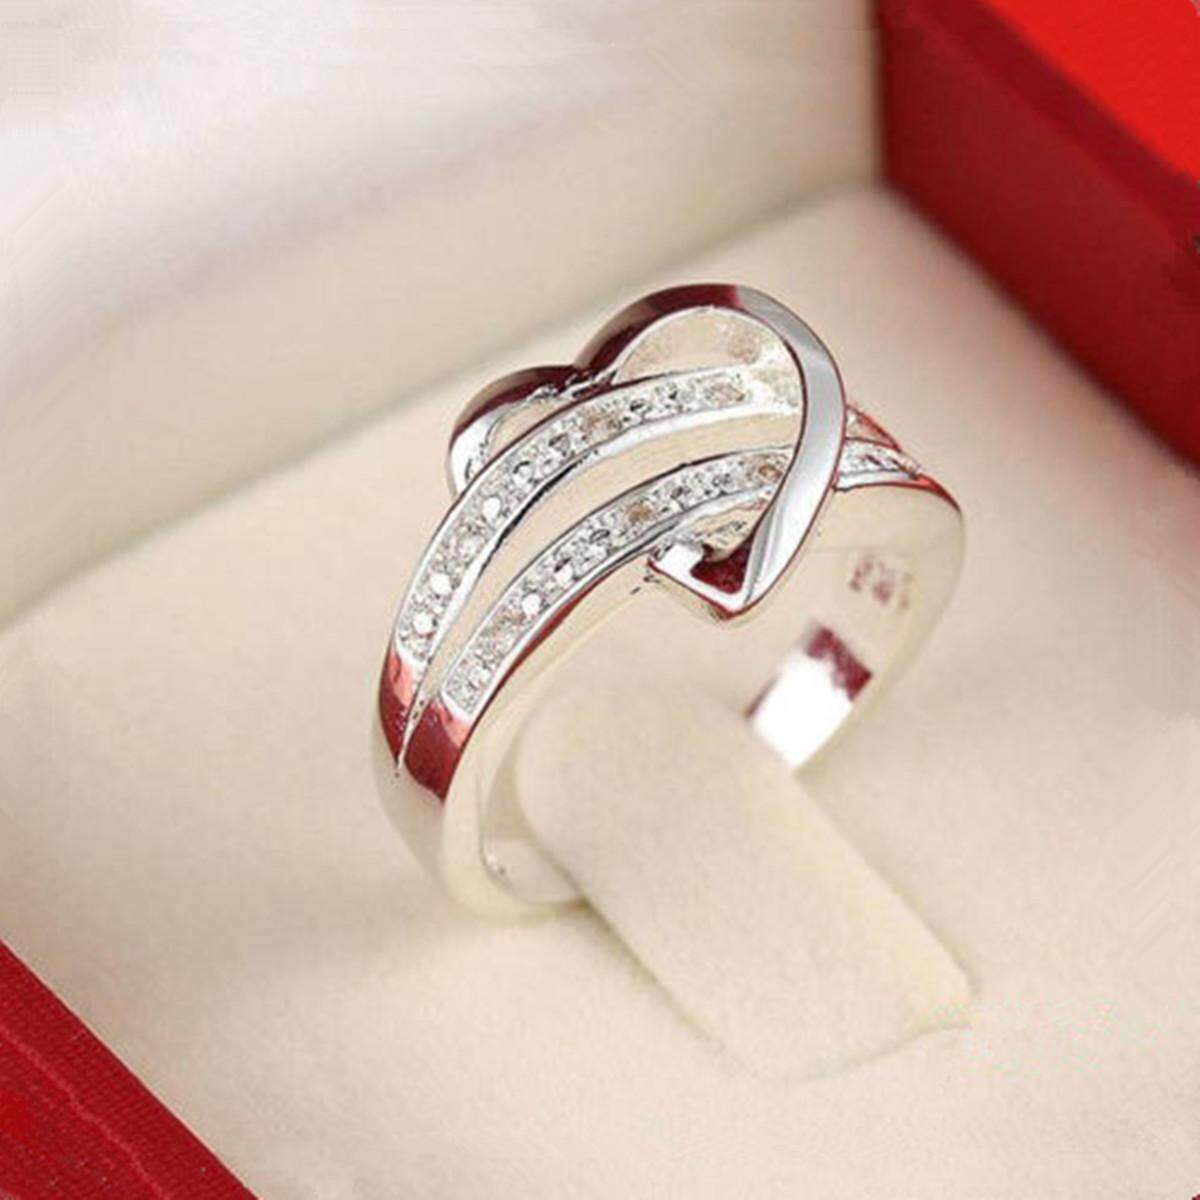 Bagus 925 Perak Batu Permata Hati Cinta Wanita Pernikahan Cincin Sz.7 8 9-Intl